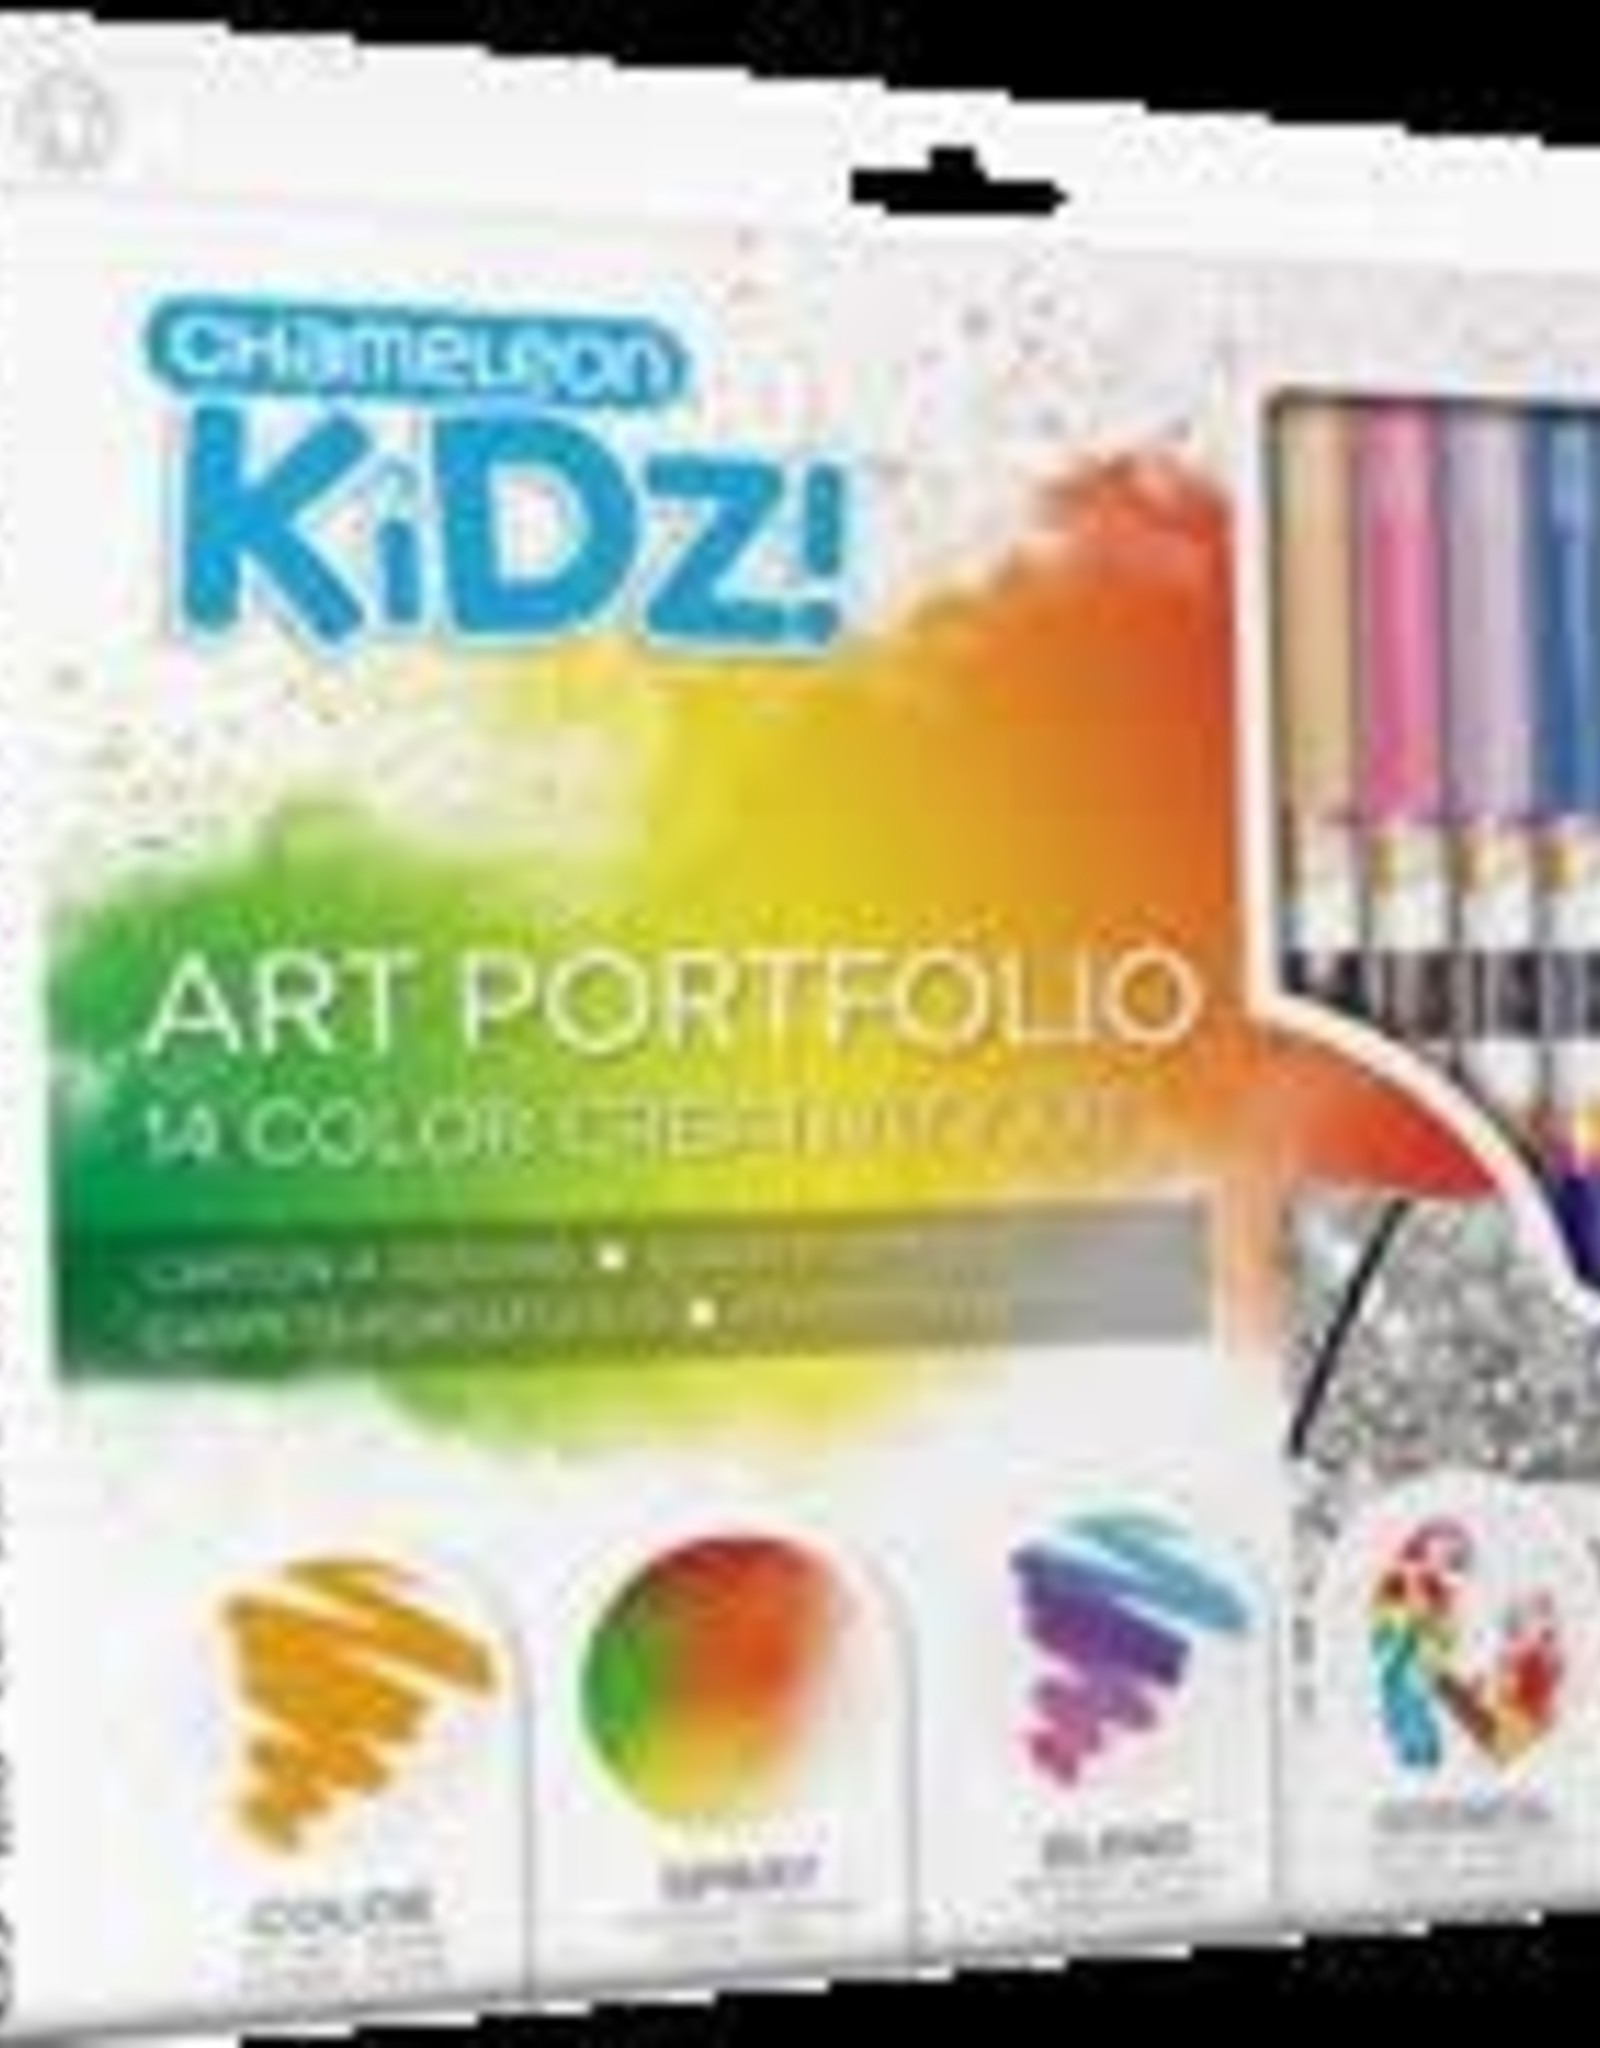 CHAMELEON KIDZ! ART PORTFOLIO 14 COLOR